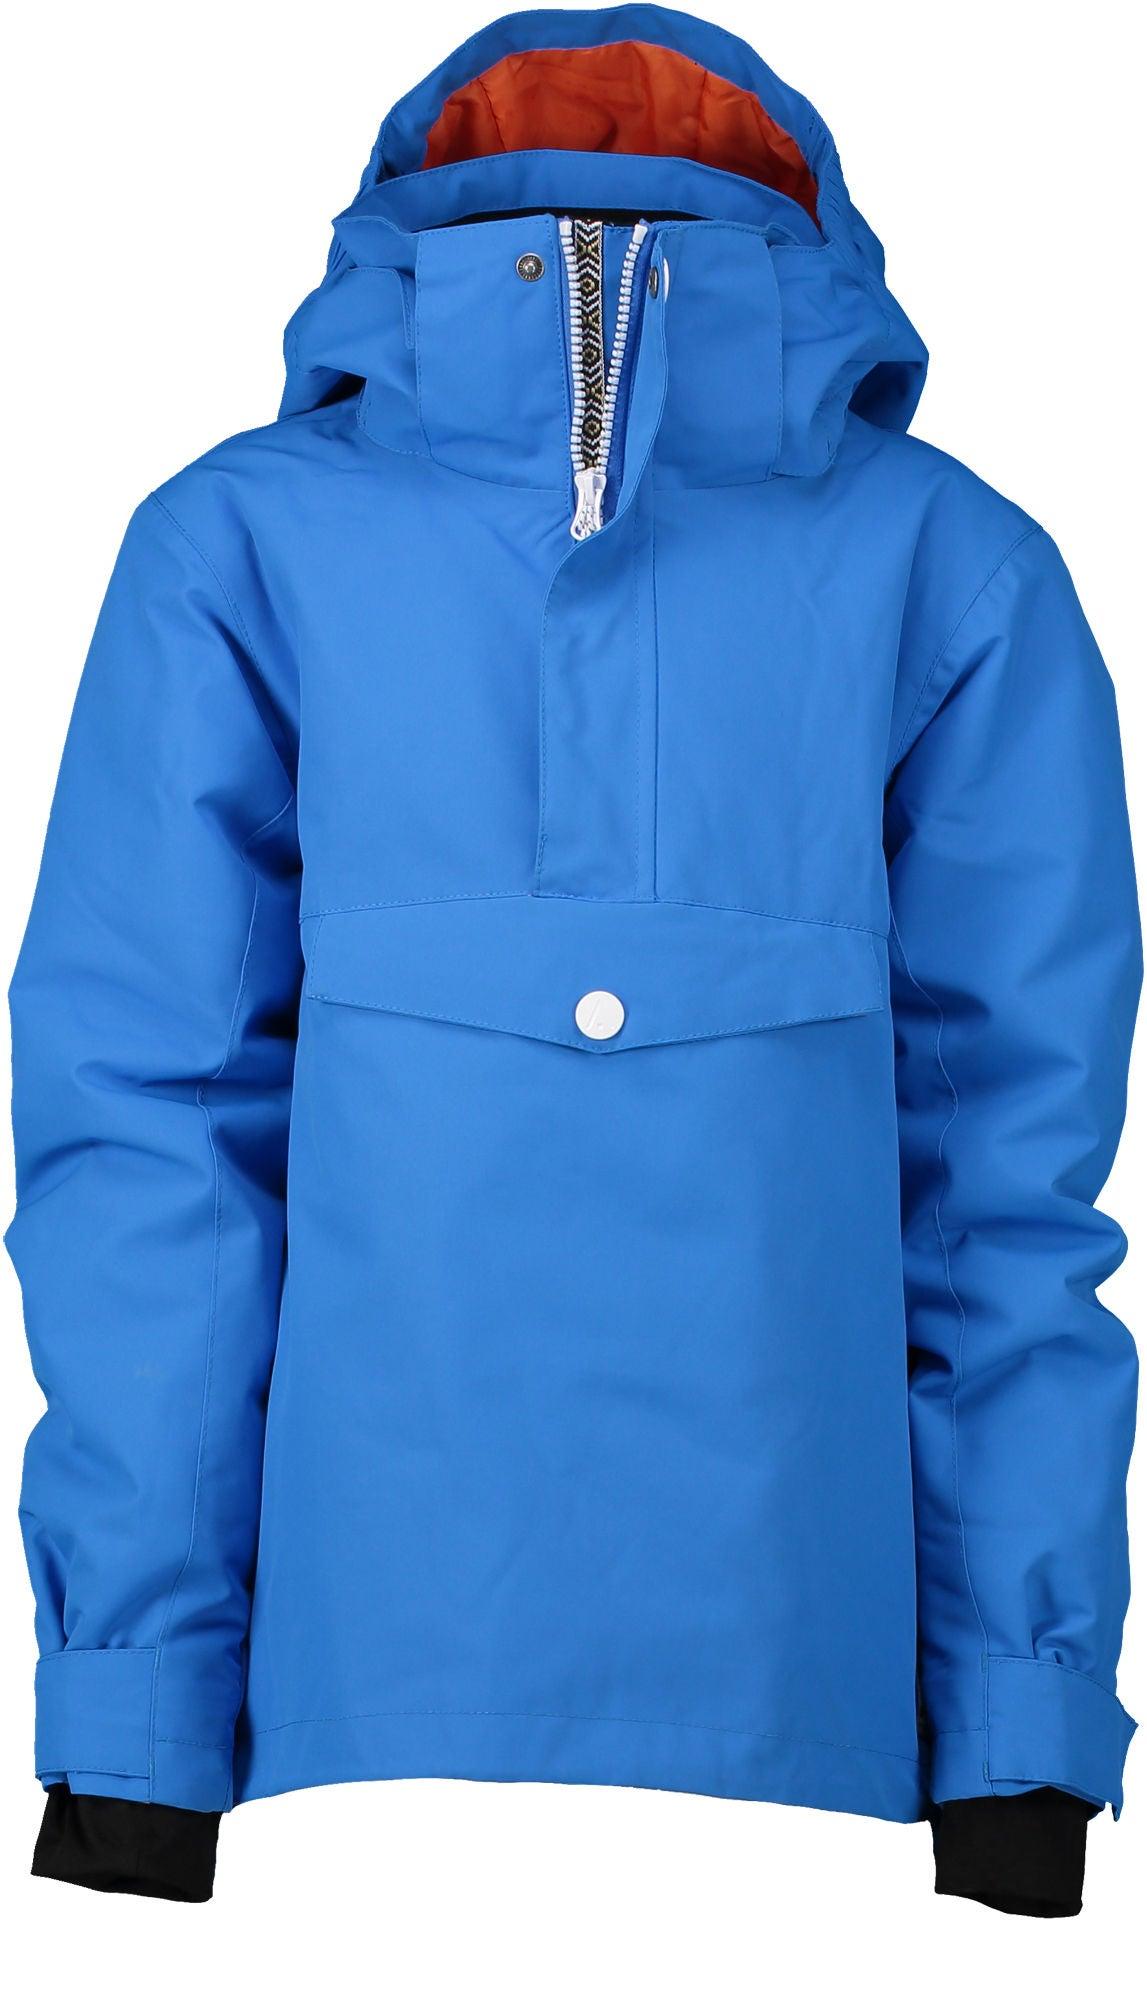 Wearcolour Top Anorak Jacka, Swedish Blue 120